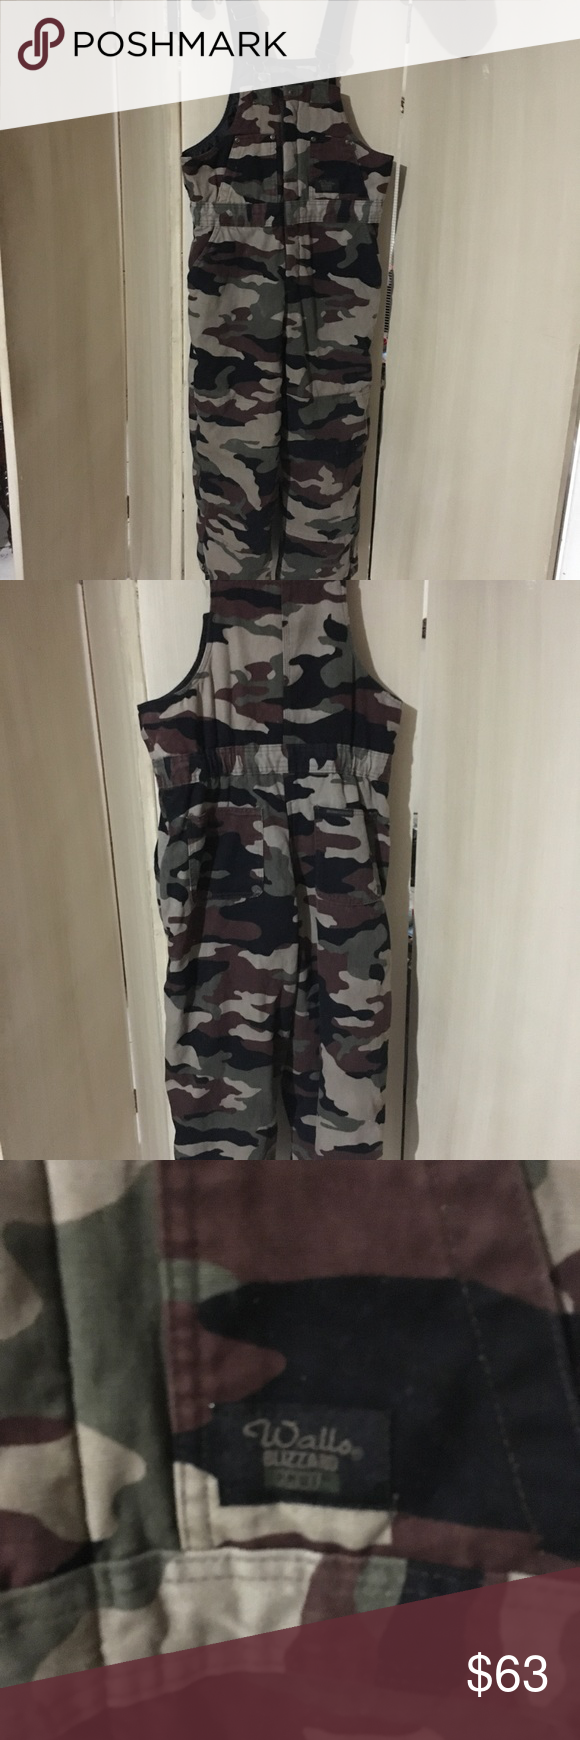 walls blizzard camo hunting overalls coveralls on walls coveralls camo id=69494